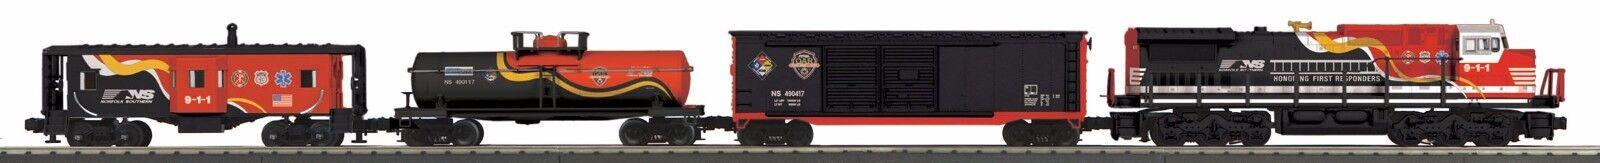 MTH 30-4239-1 o calibre Railking Dash - 8 Diesel R-T-R Conjunto de tren de carga con proto-S